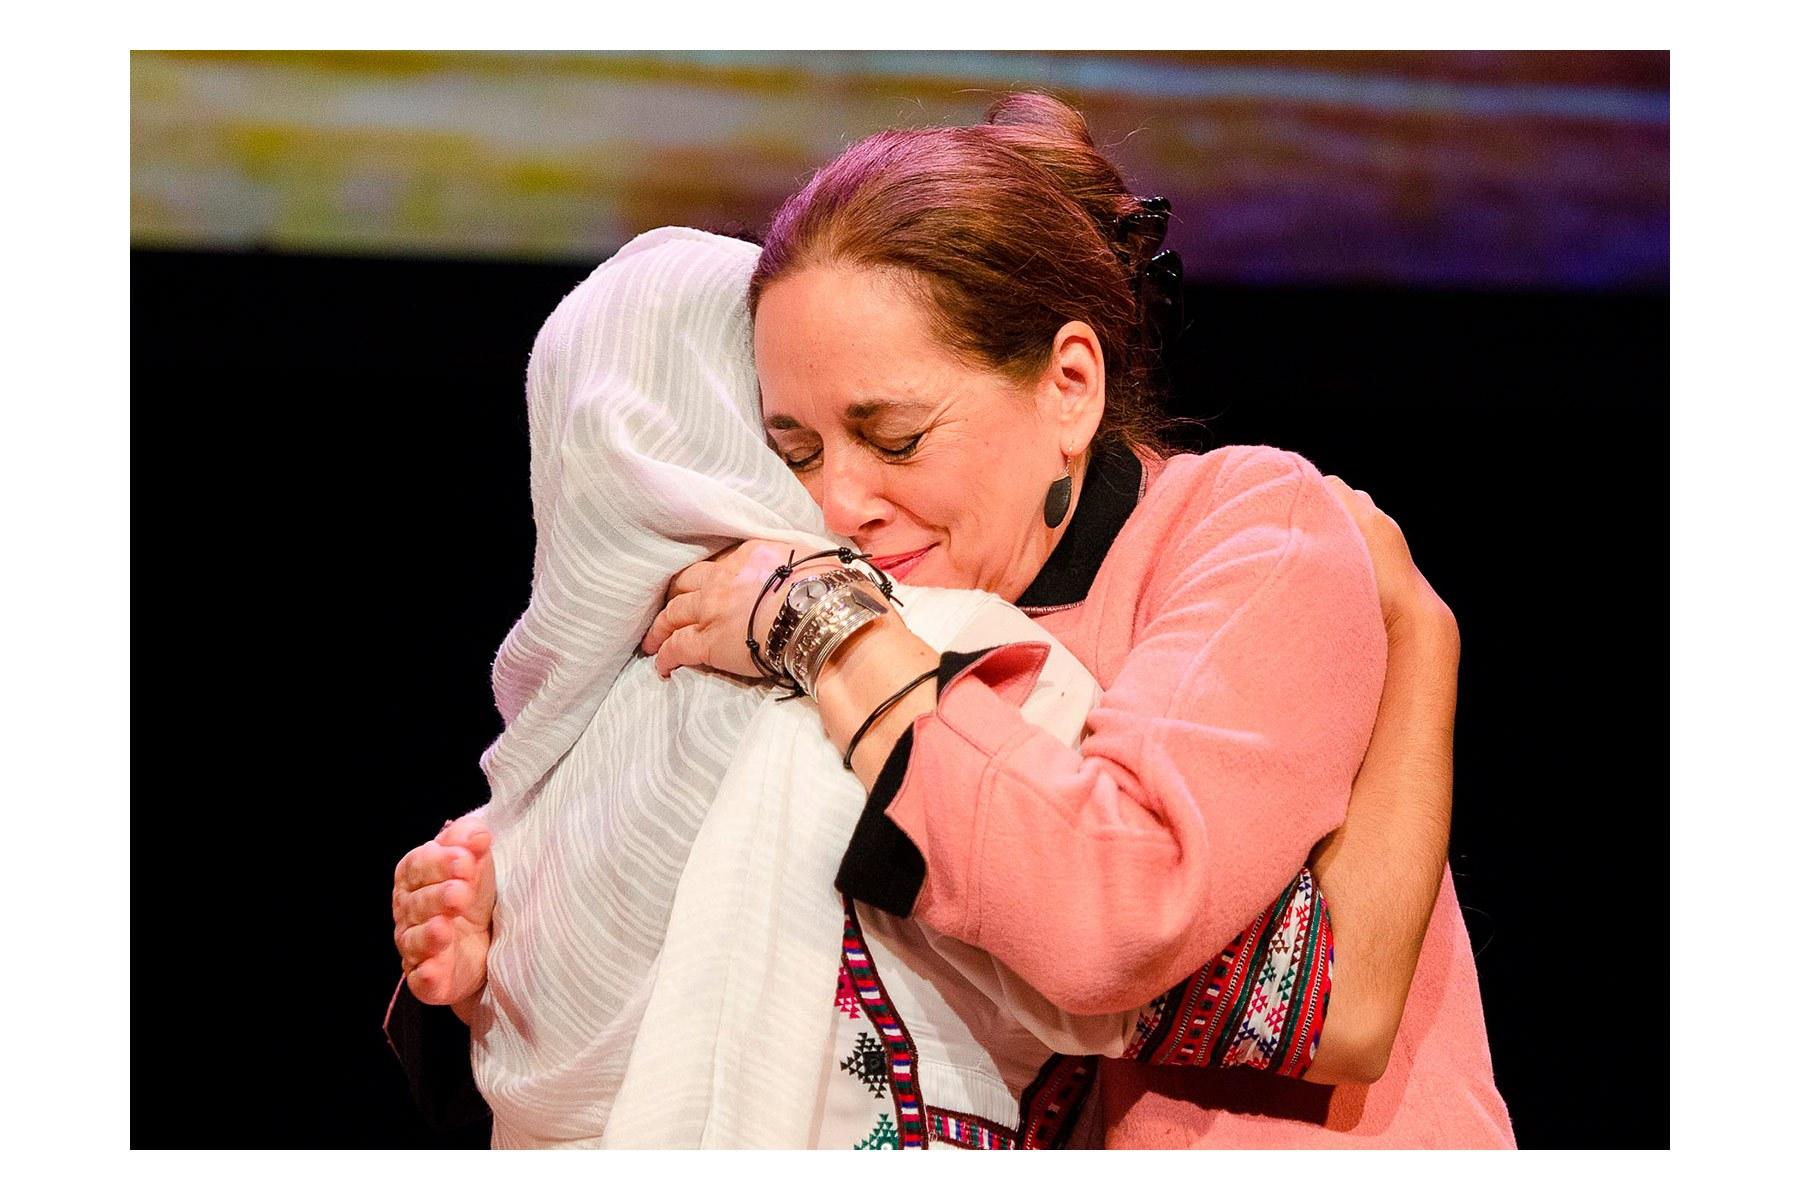 Khalida Brohi, Sughar Empowerment Society, Pakistan, World Affairs Council of Oregon, 04-23-2014